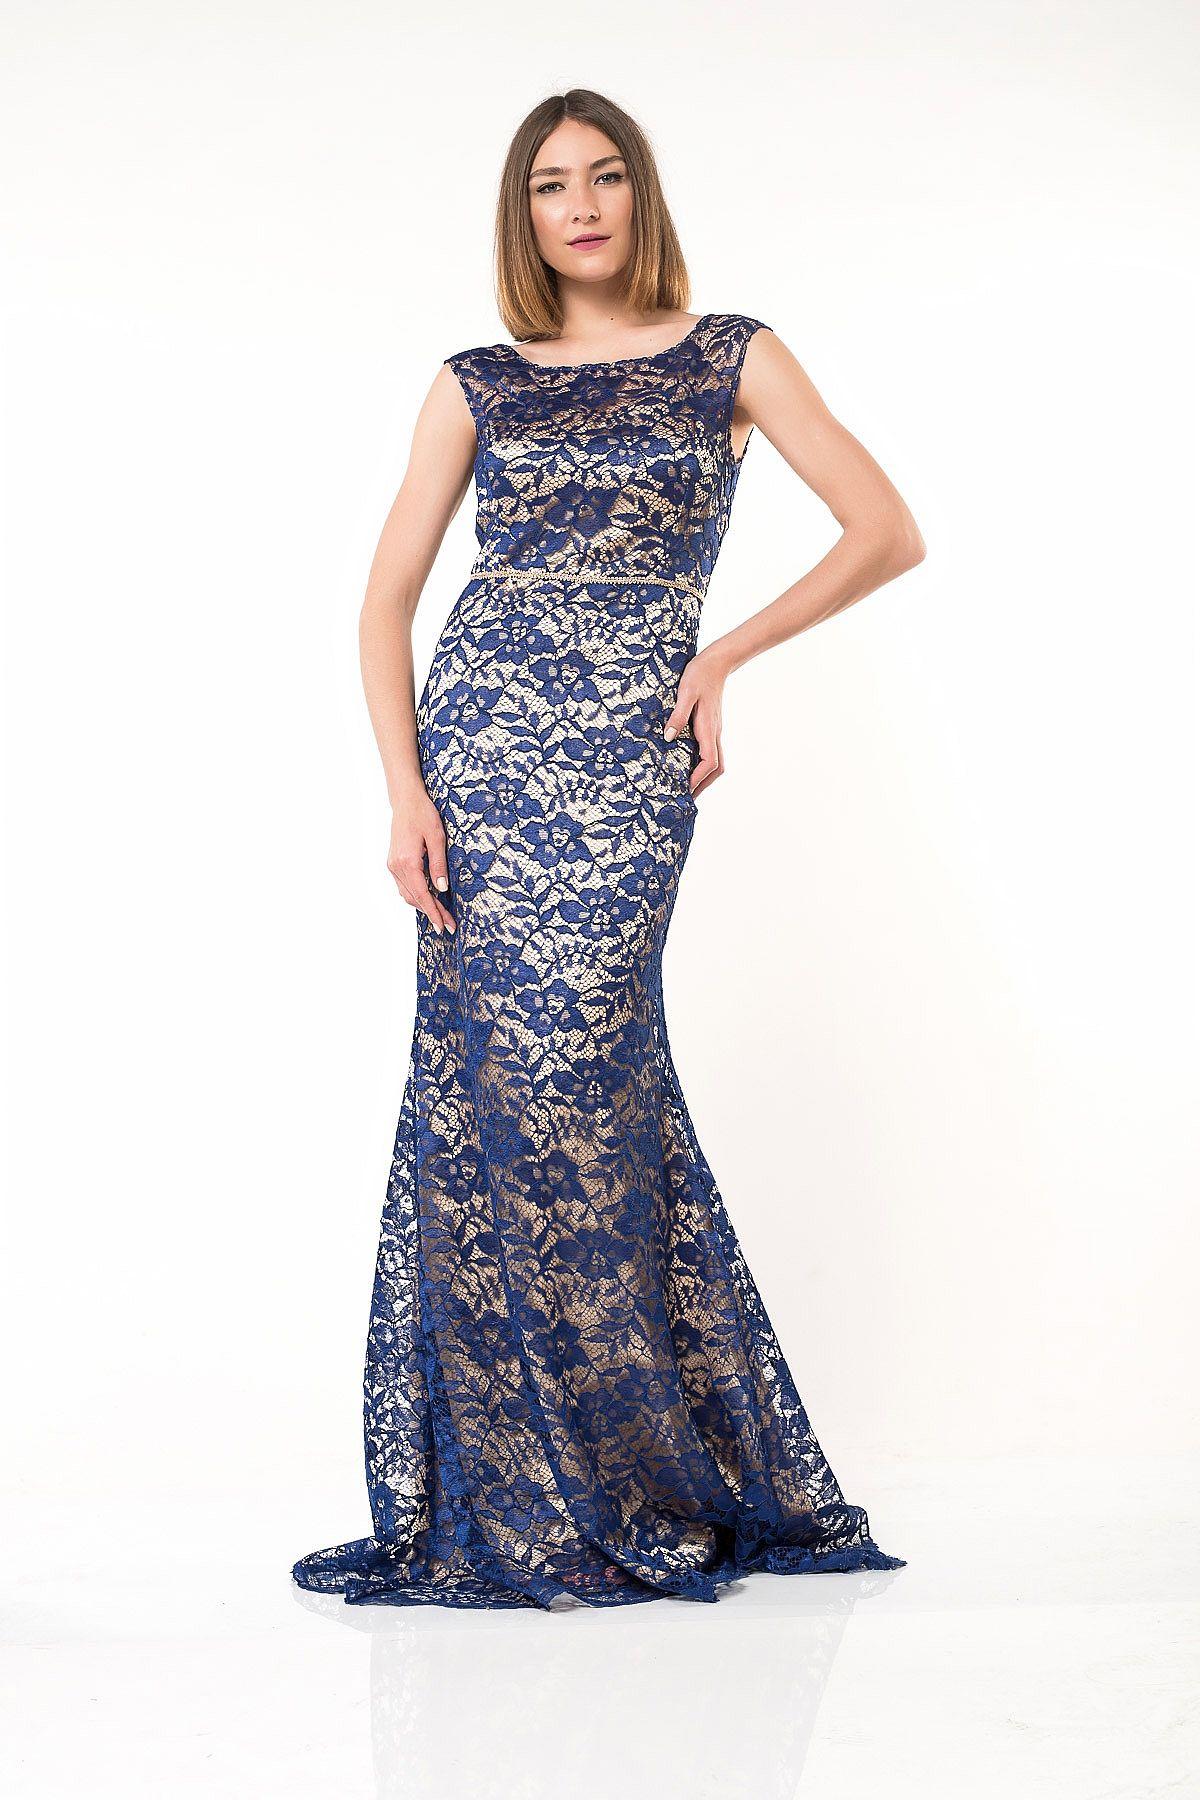 11f8aeb2945 Φόρεμα μπεζ με μπλε δαντέλα maxi σε γοργονέ στυλ